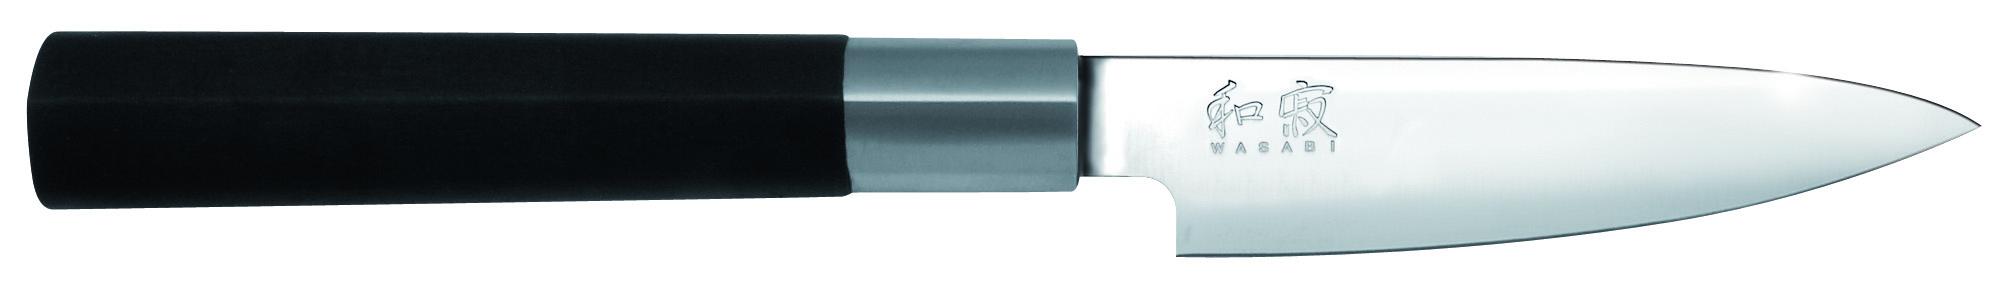 Univerzálny kuchynský nôž Wasabi Black 6710P